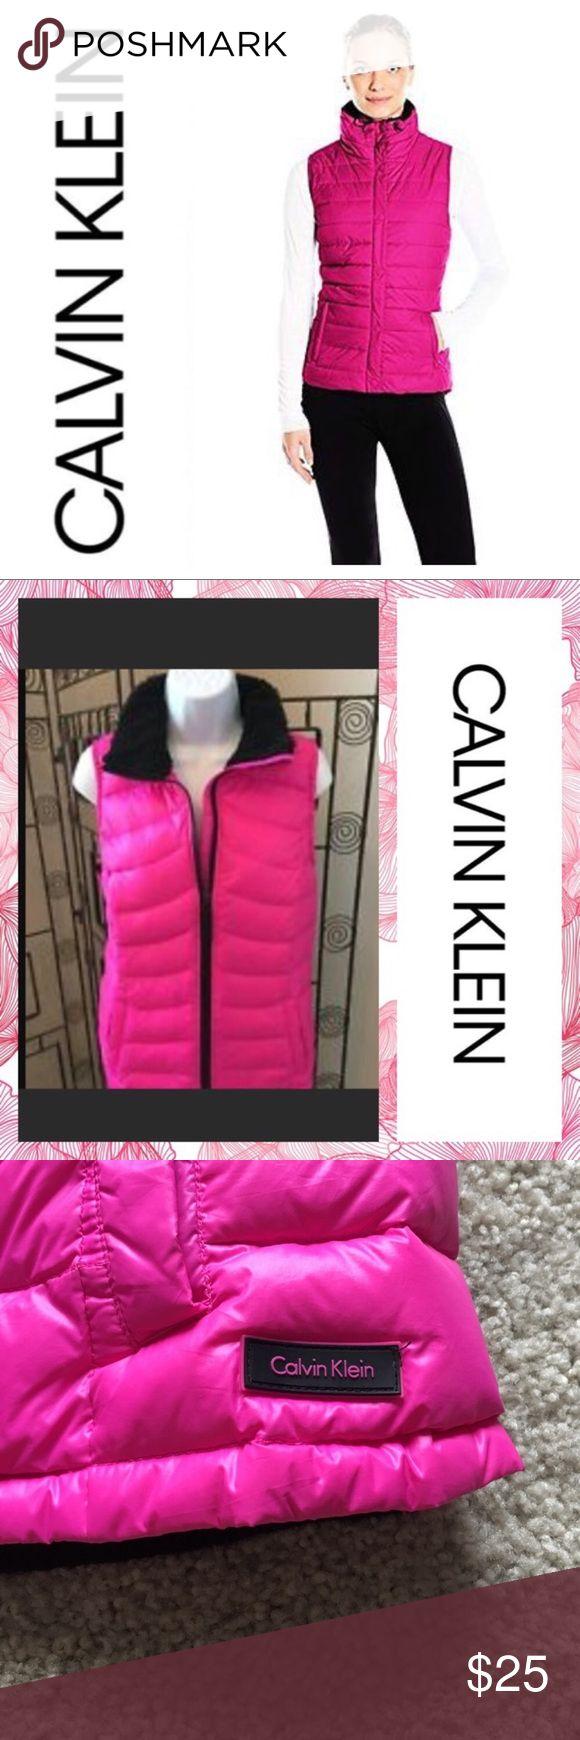 Calvin Klein pink puffer vest Calvin Klein pink puffer vest, wonder resistant, MP3 pocket, size medium only worn once Calvin Klein Jackets & Coats Puffers